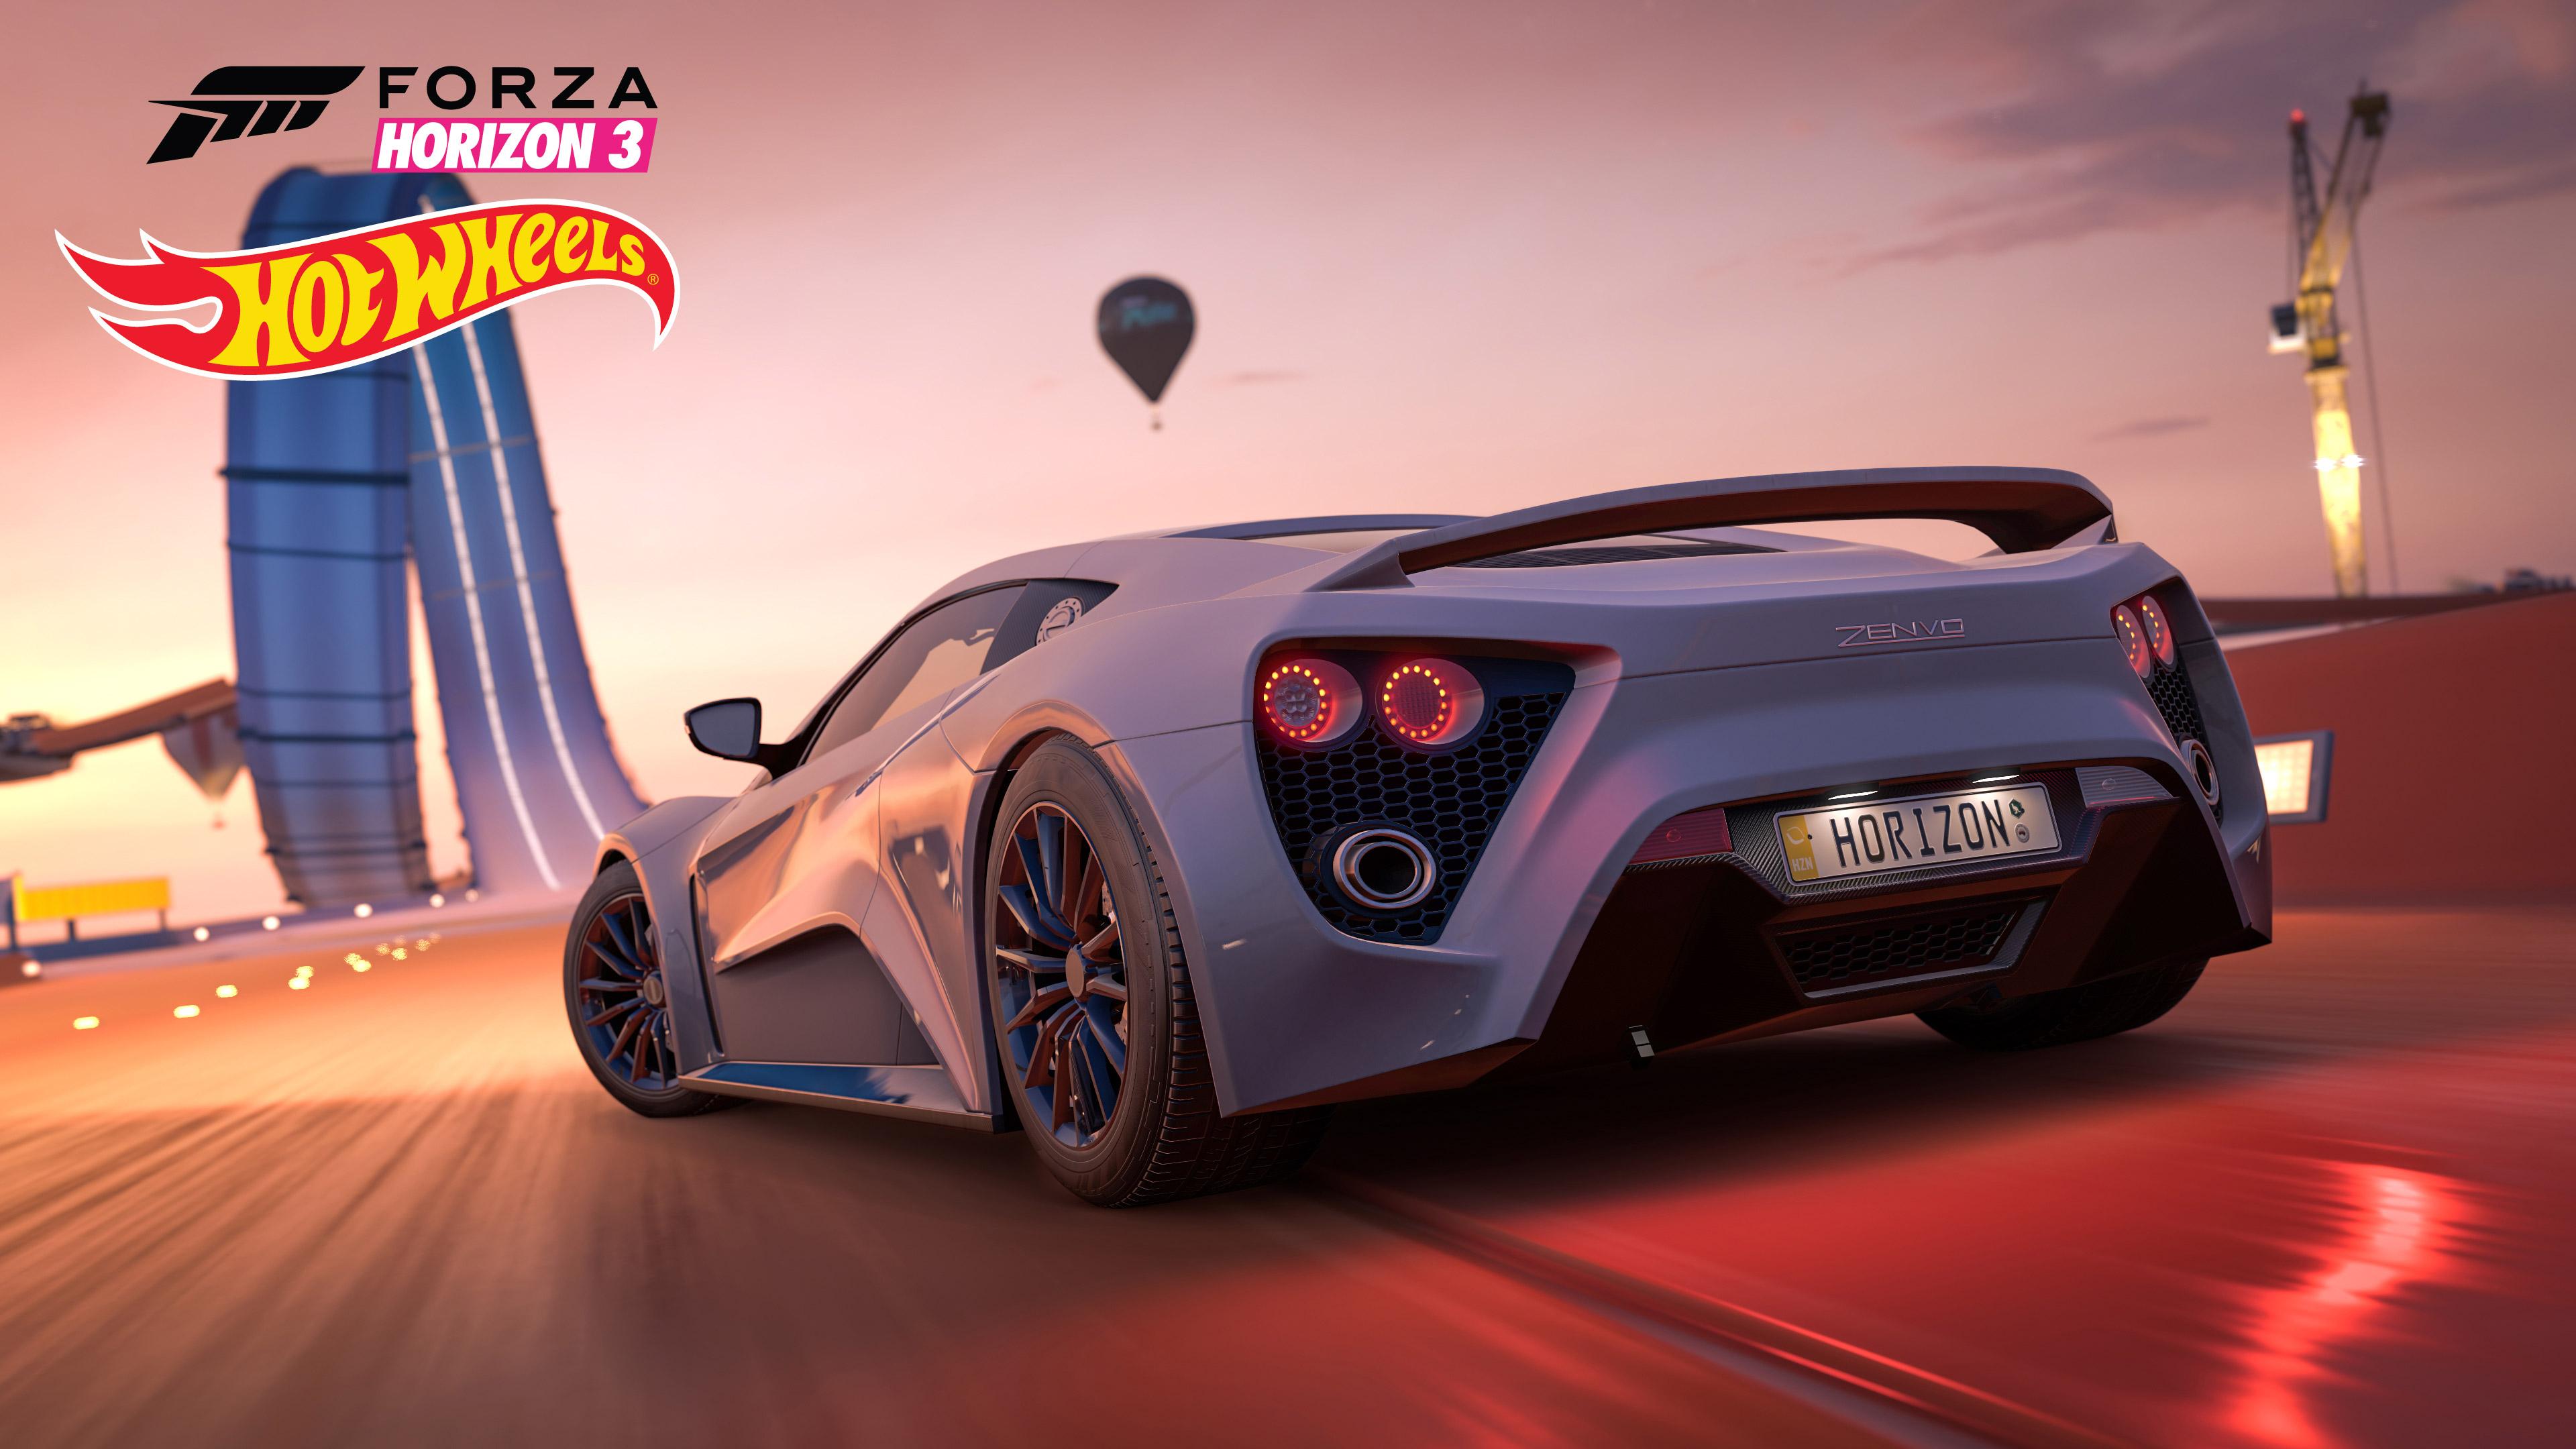 Forza horizon 3 hot wheels hd games 4k wallpapers - Is forza horizon 3 4k ...